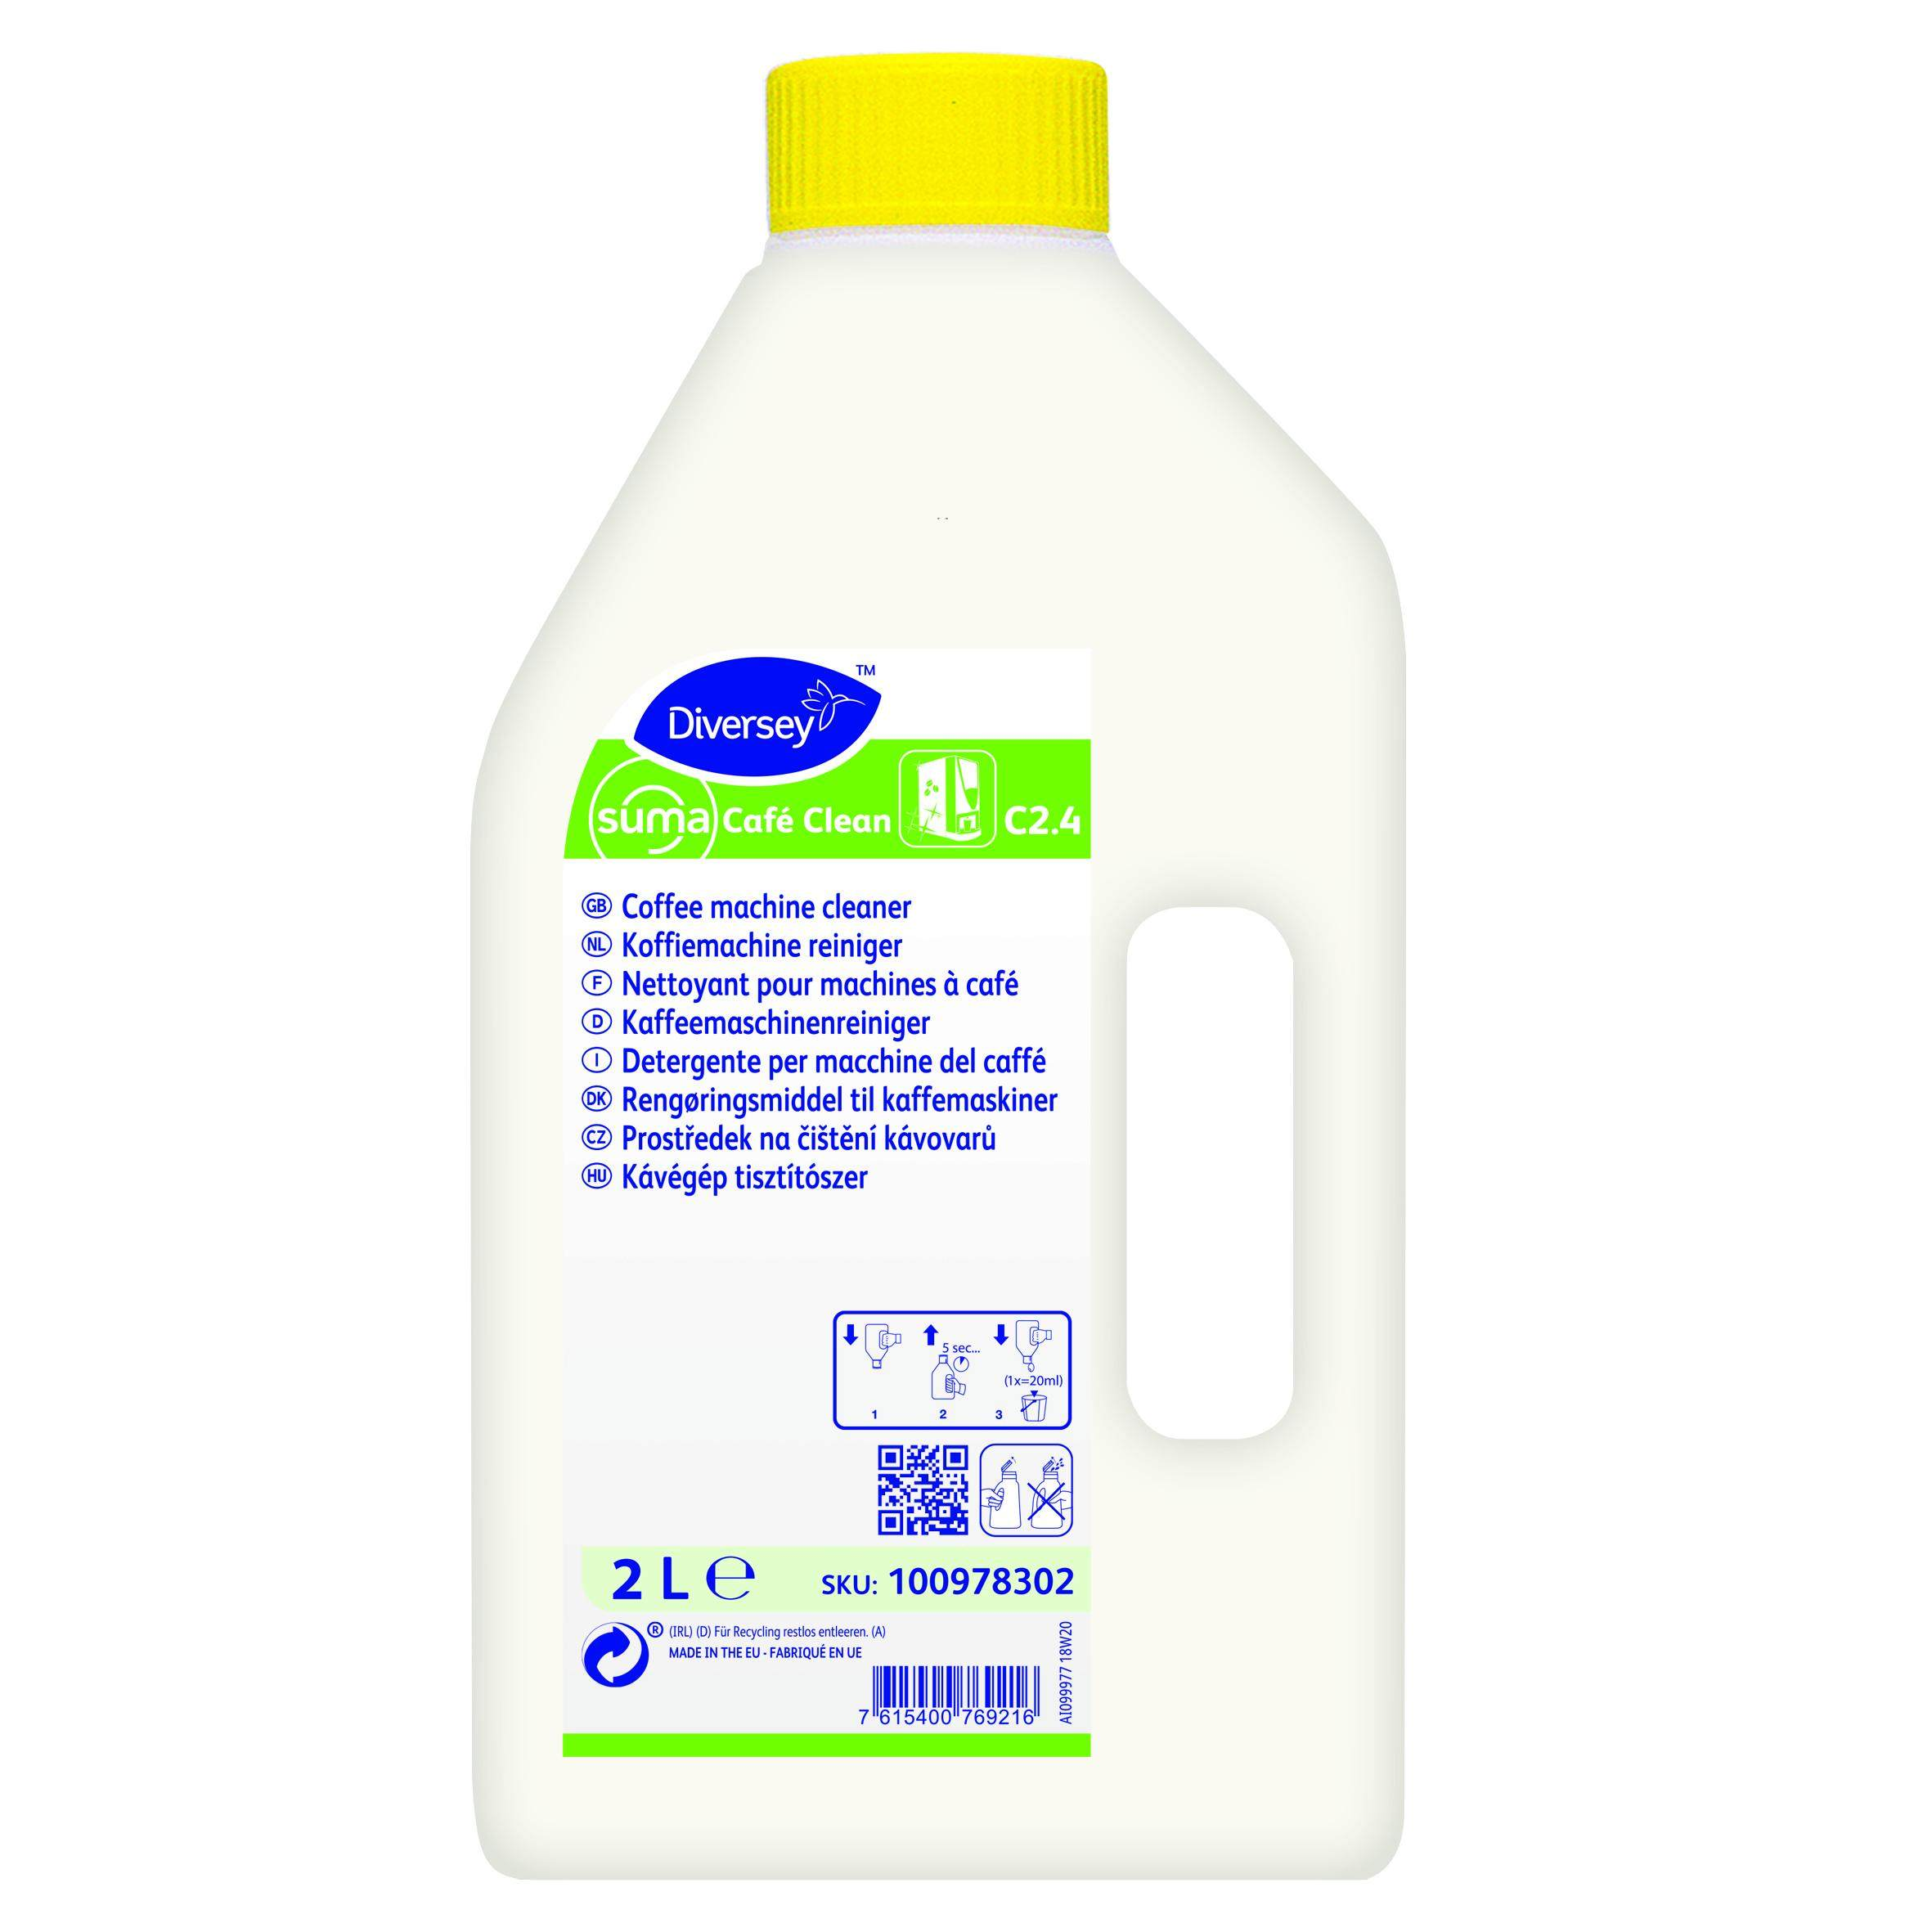 100978302-Suma_Cafe_Clean_C2.4-2L-CMYK-20x20cm.jpg